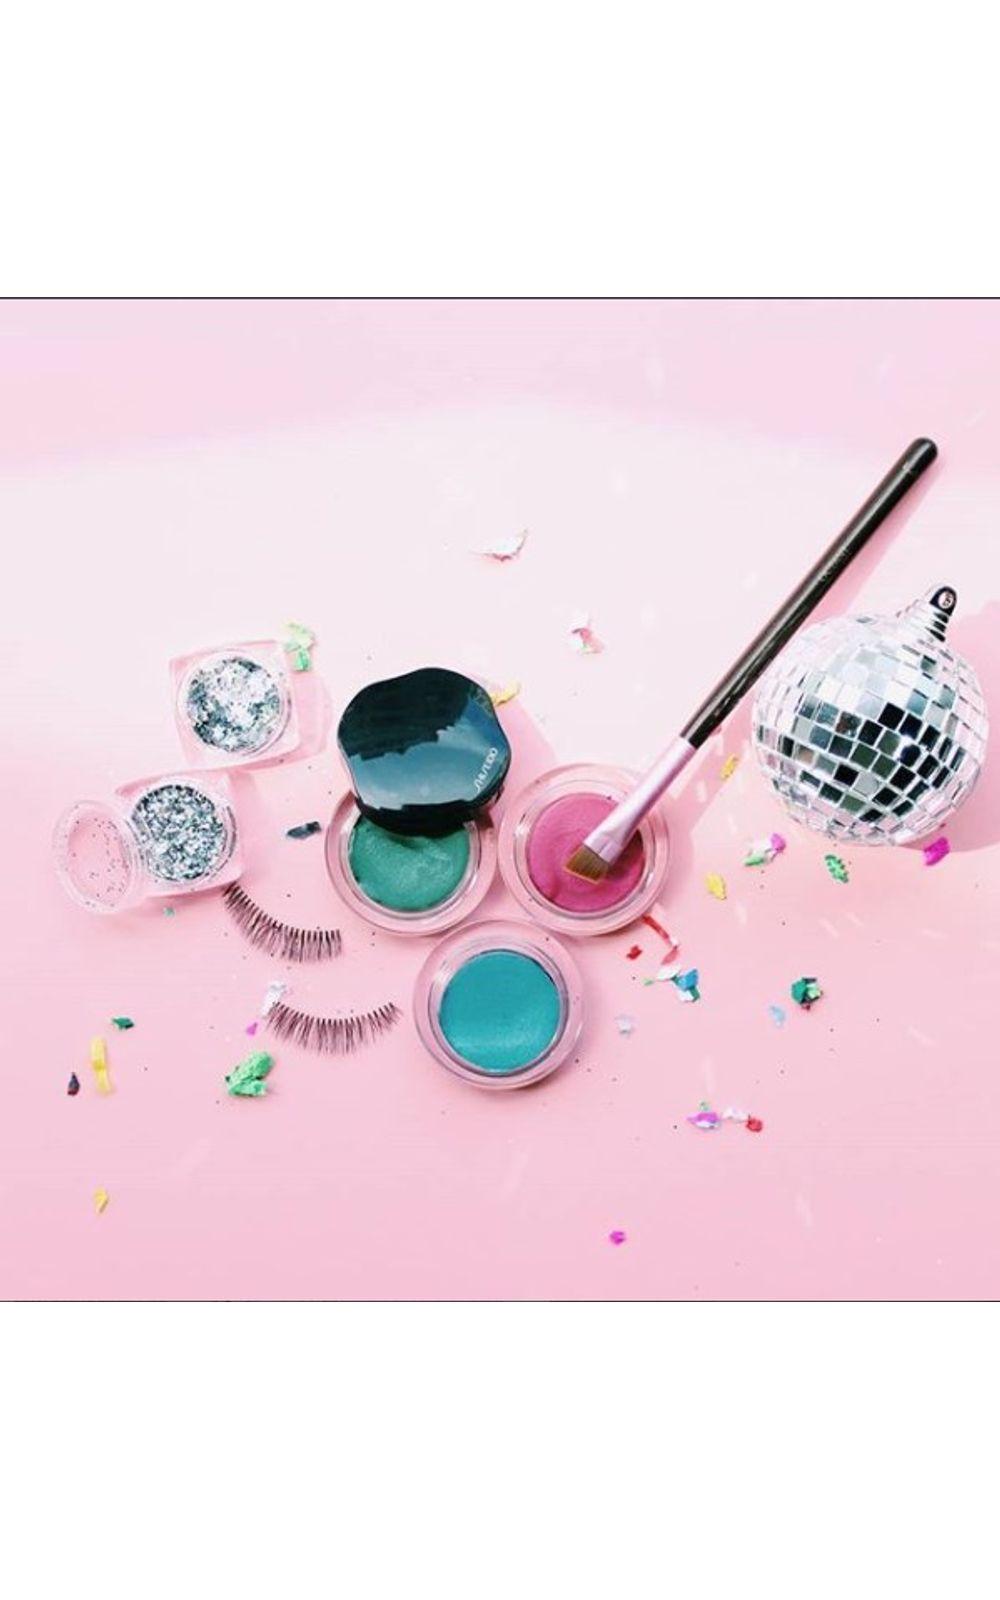 Foto 5 - Shimmering Cream Eye Color Shiseido - Sombra - VI226